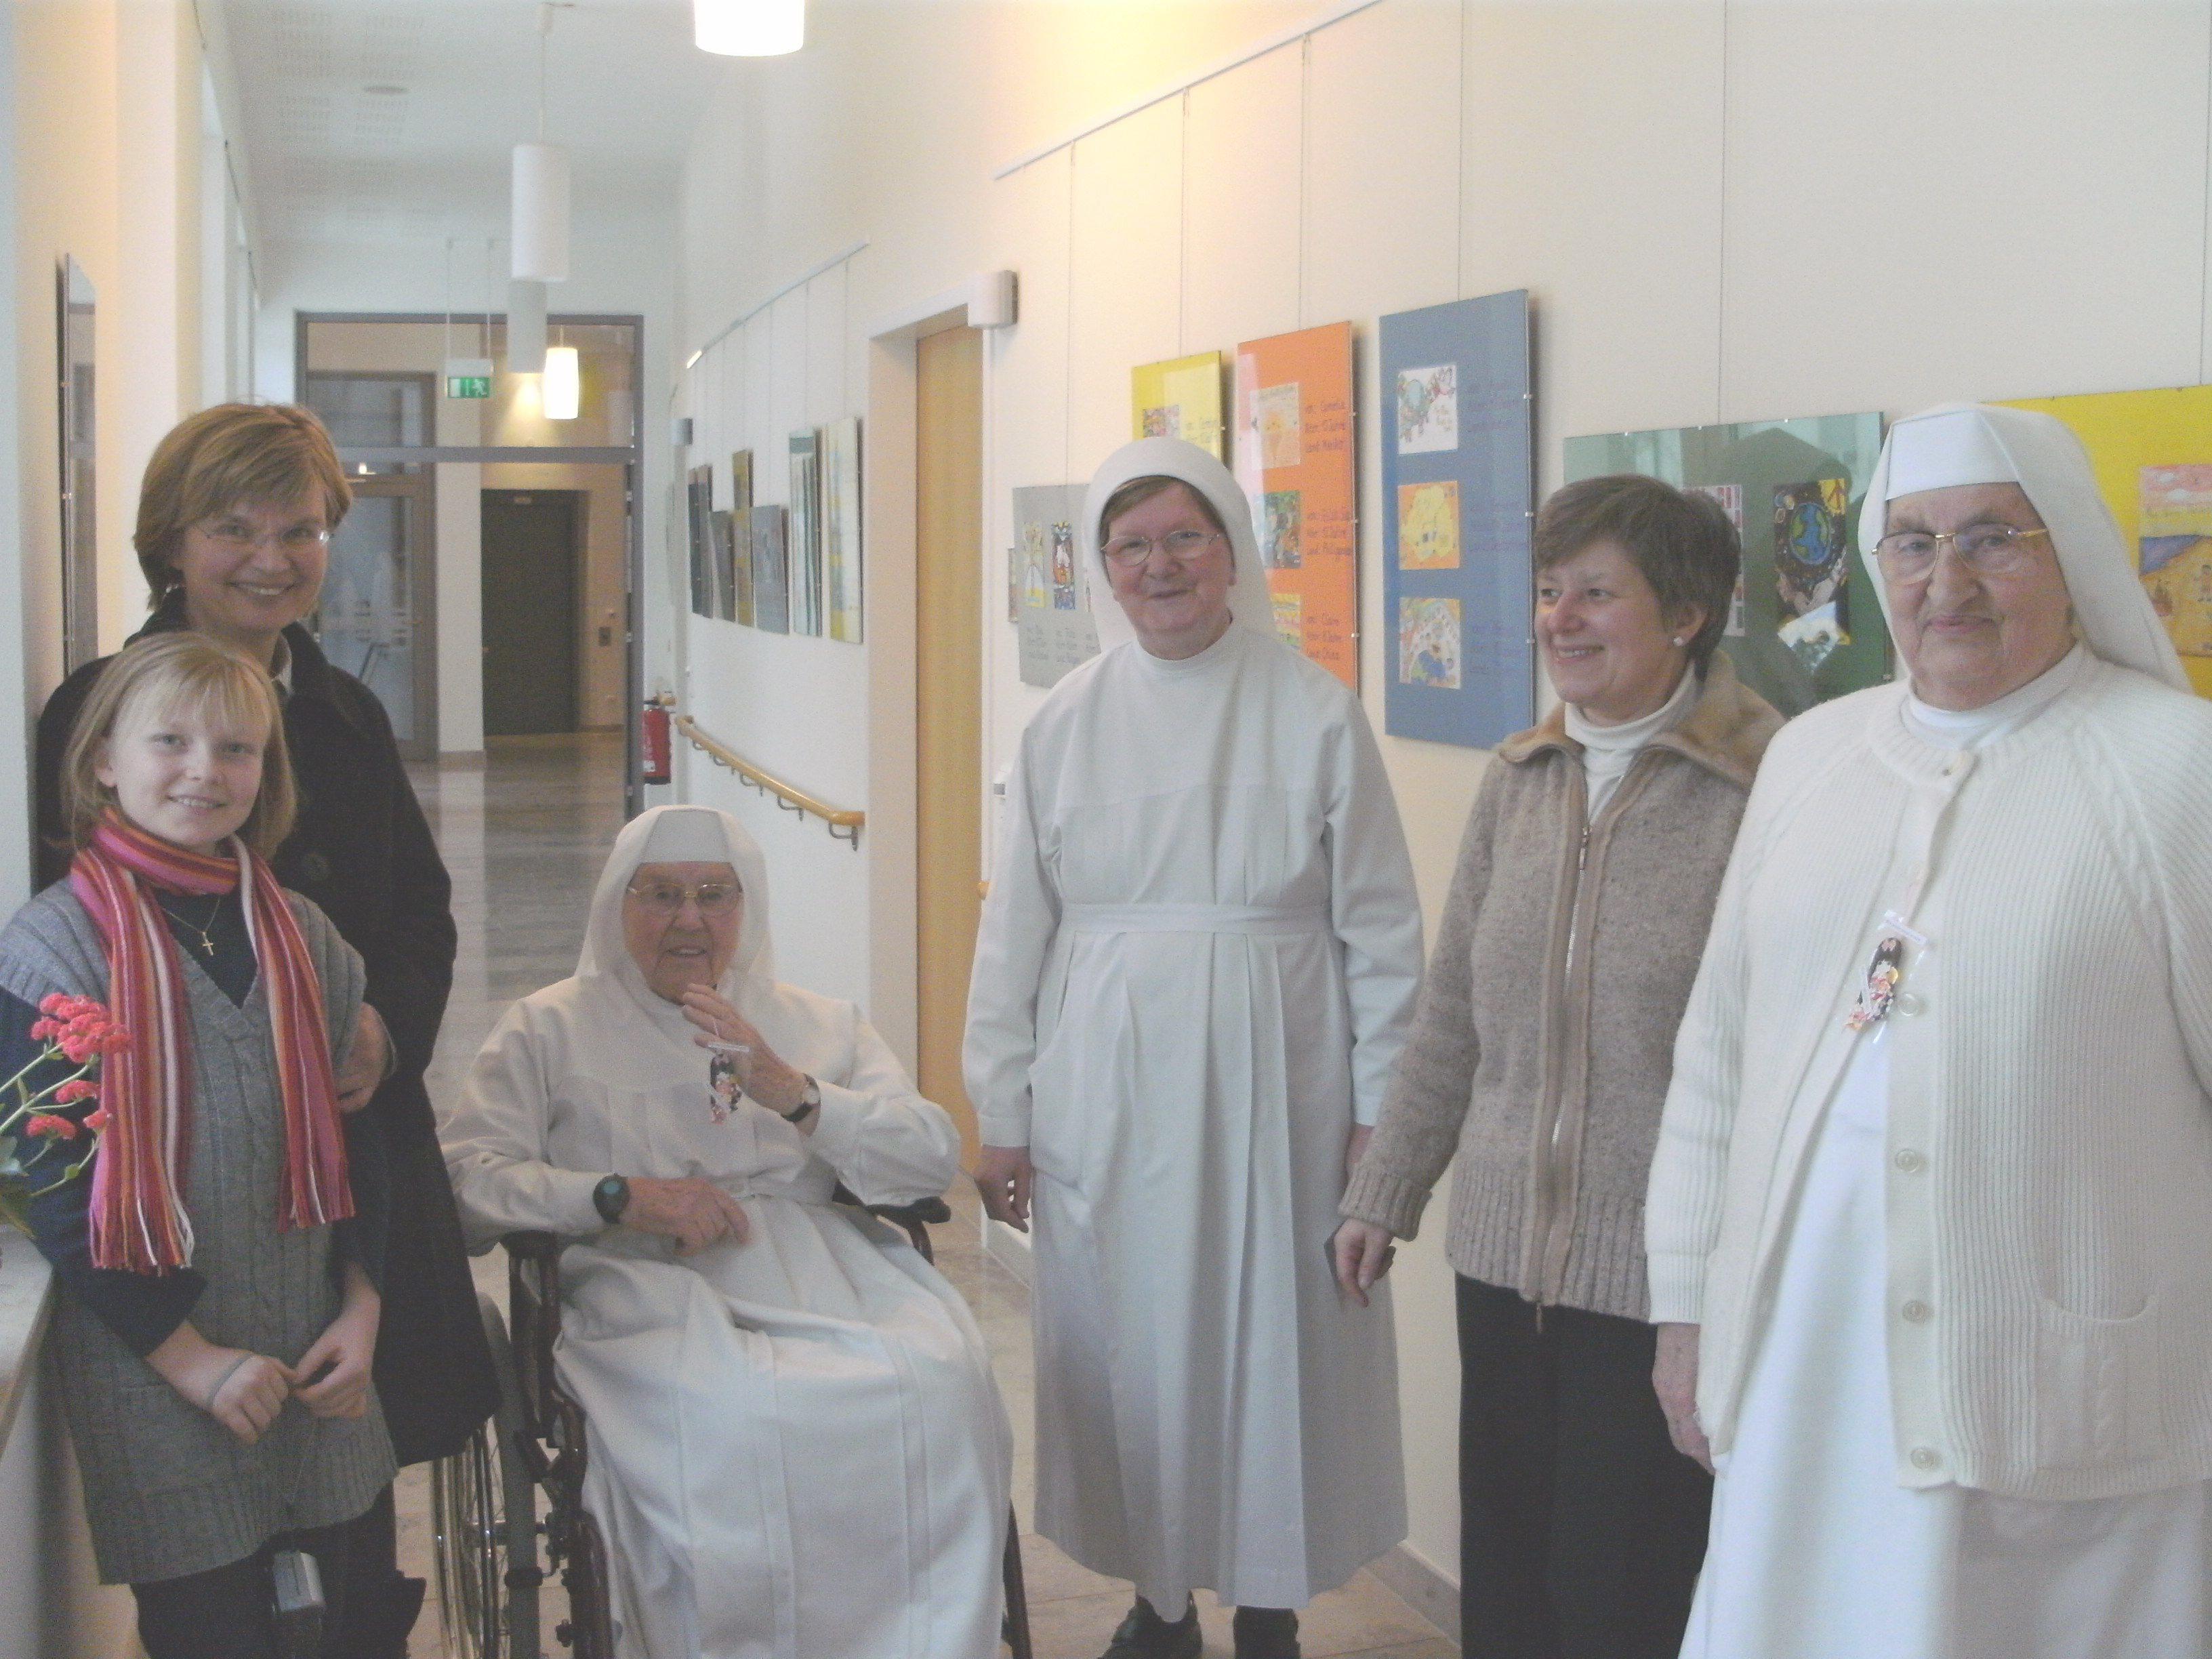 Mother Superior Ebefana, Managing Director Mrs. Hettmer & Staff,(left) Dagmar Berkenberg with daughter Laura